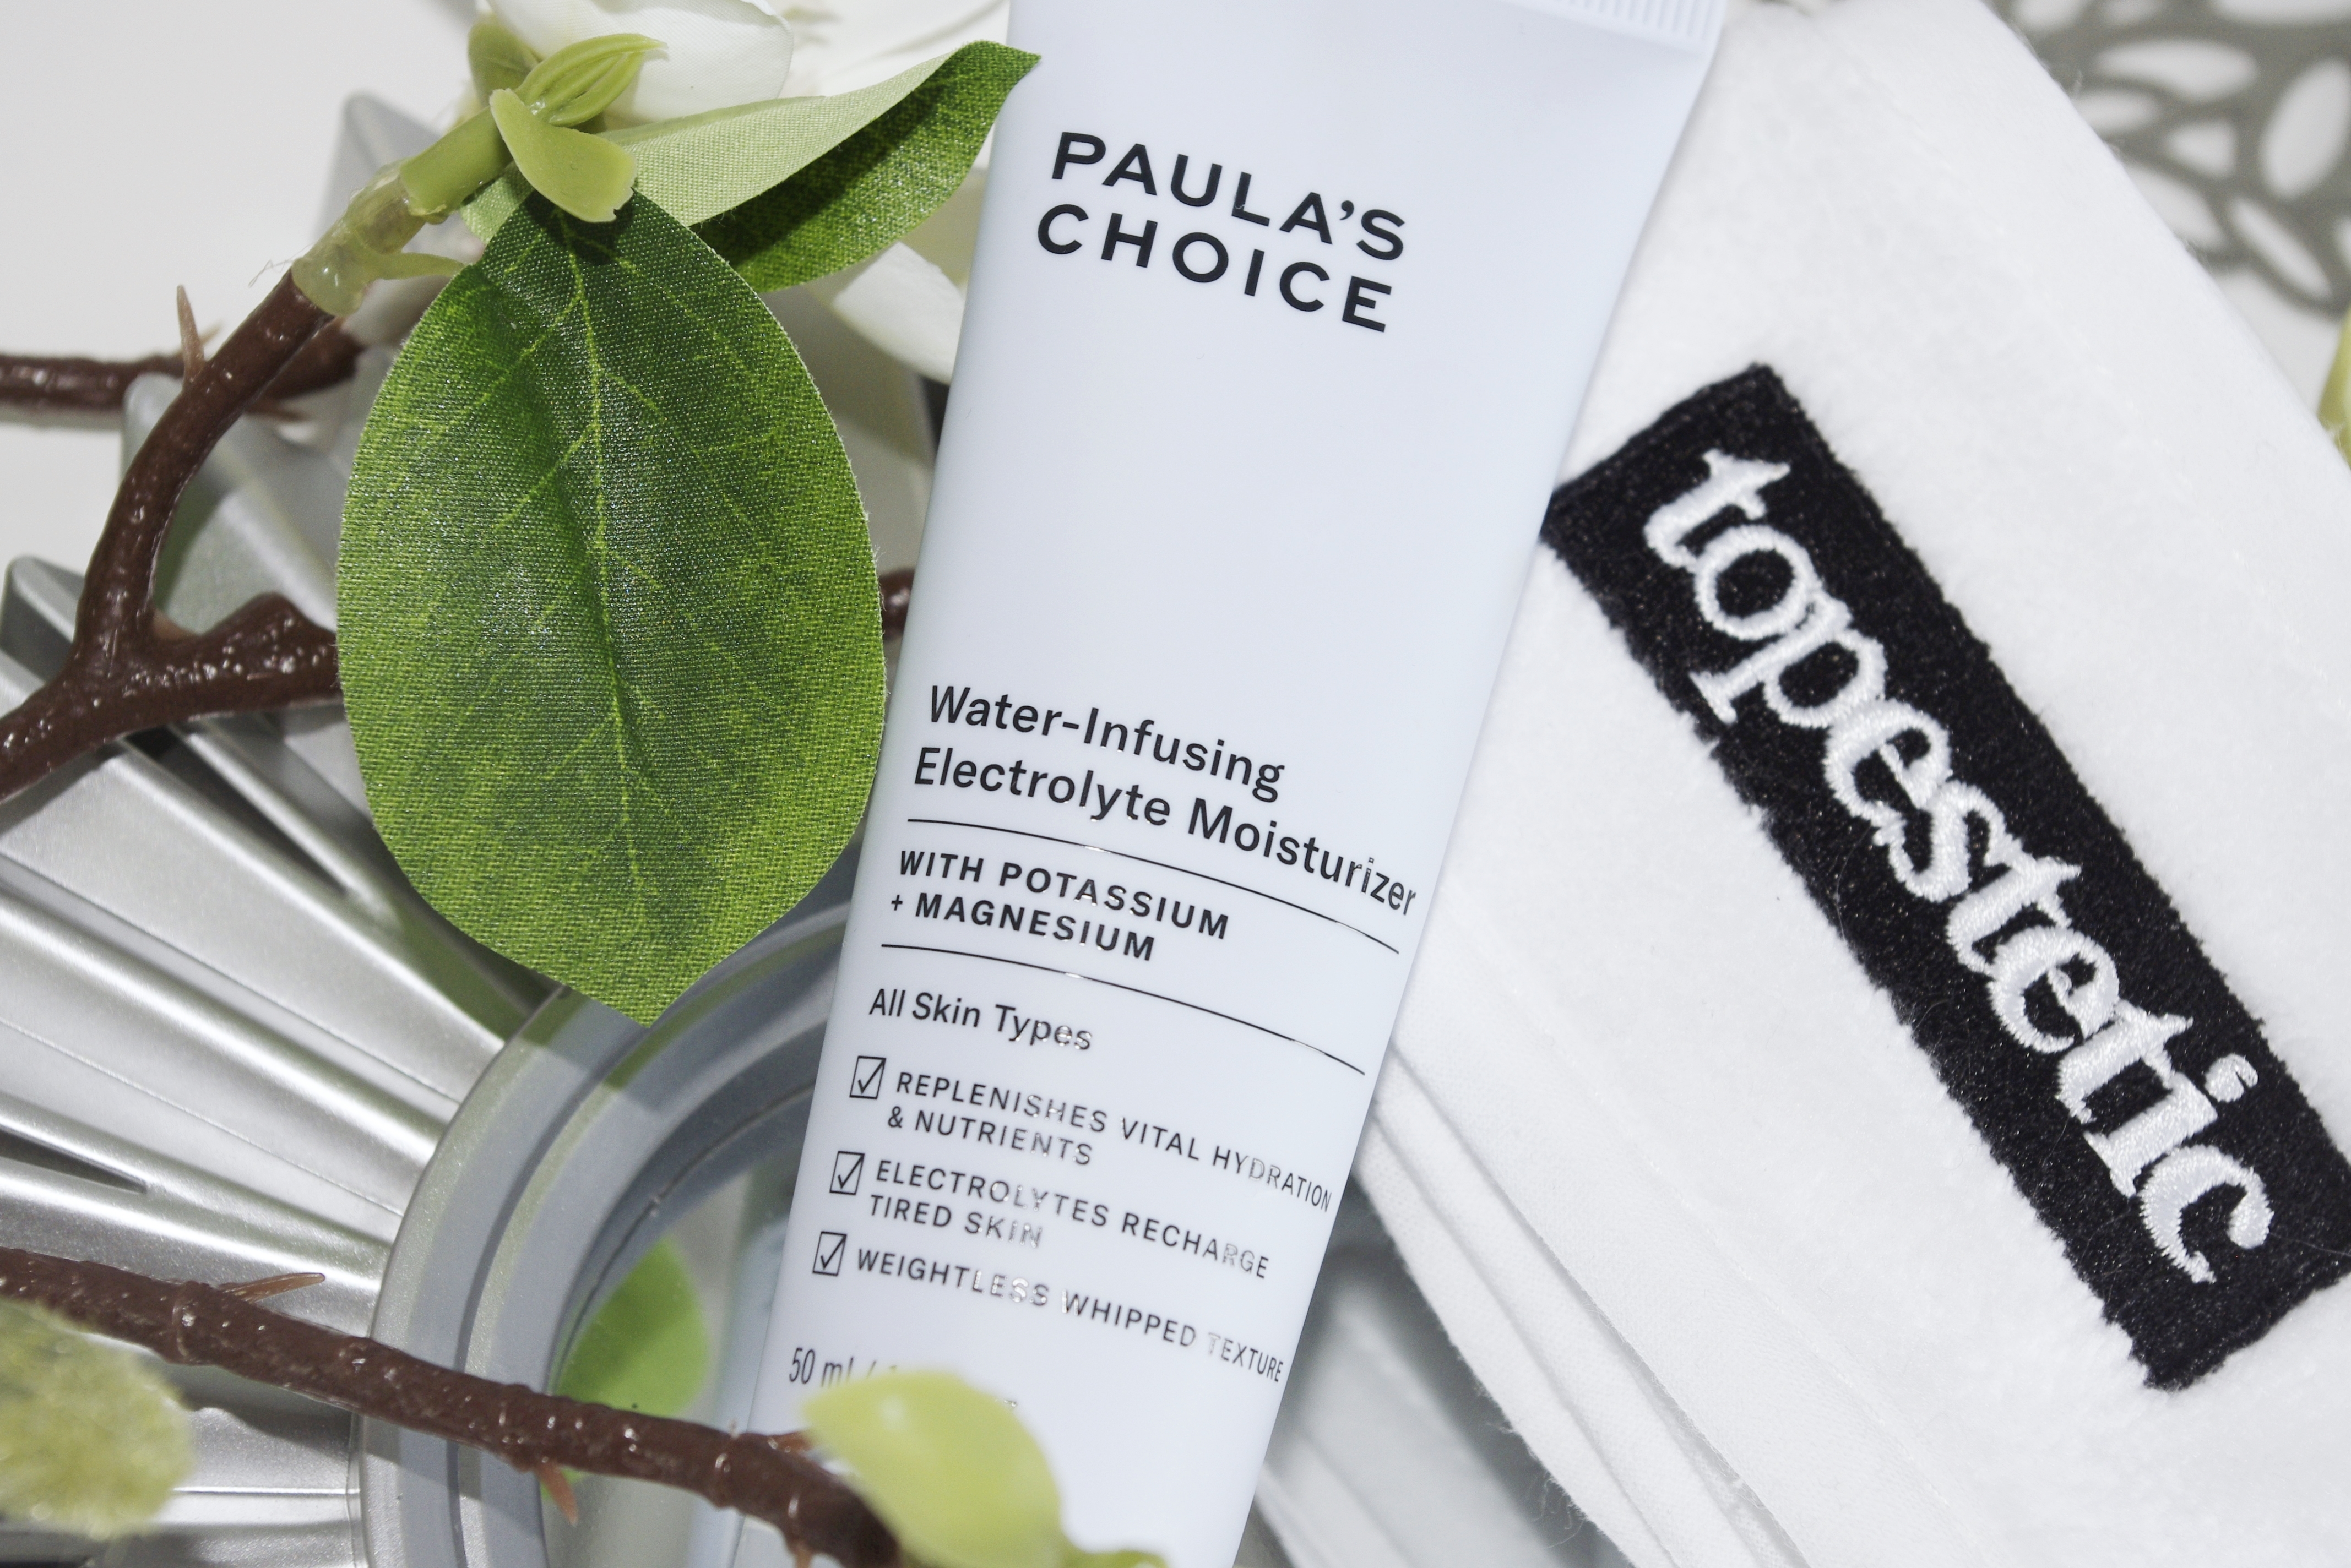 Paulas Choice Water - Infusing Electrolyte Moisturizer